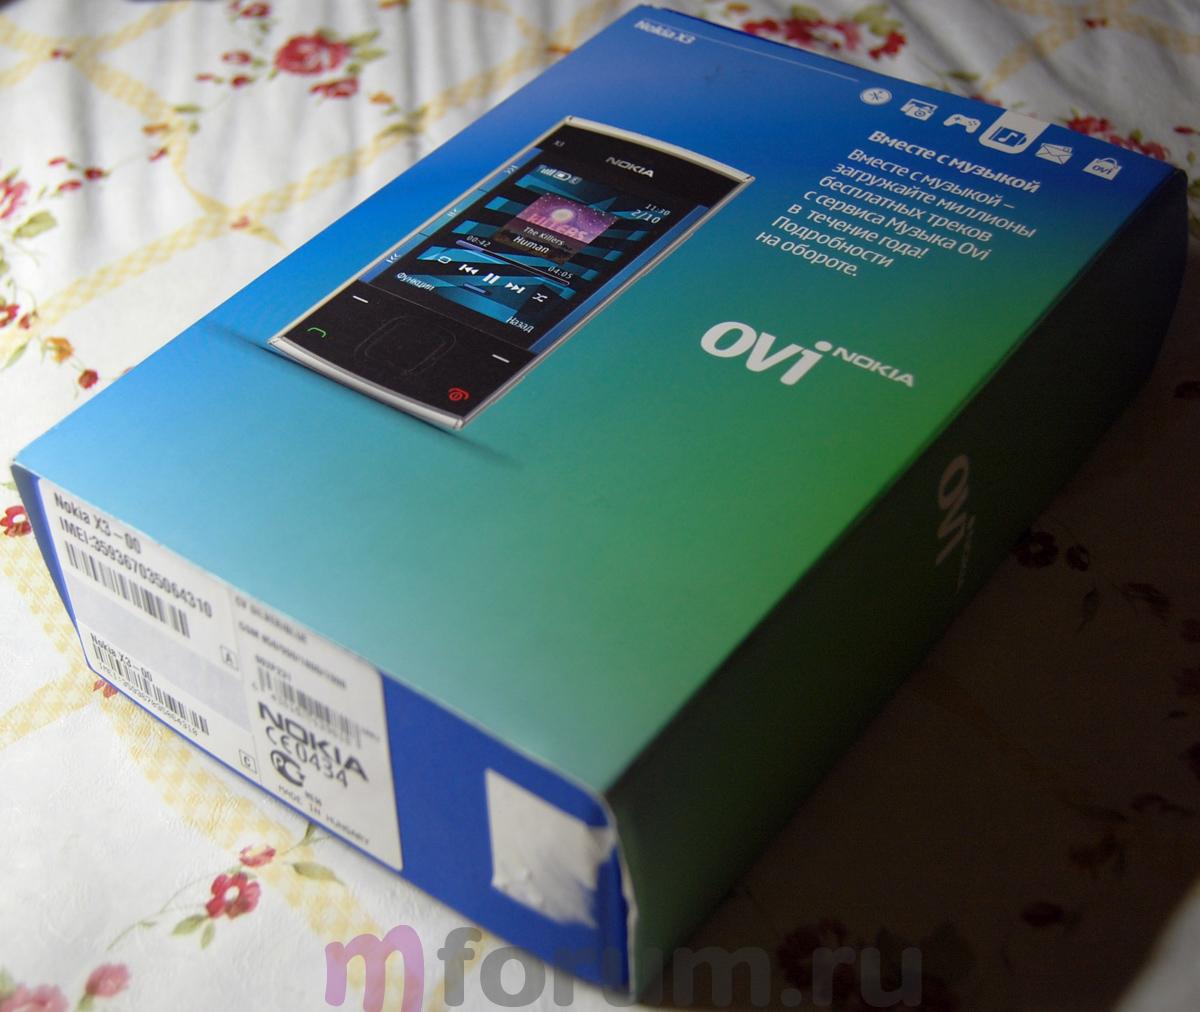 Nokia d 1